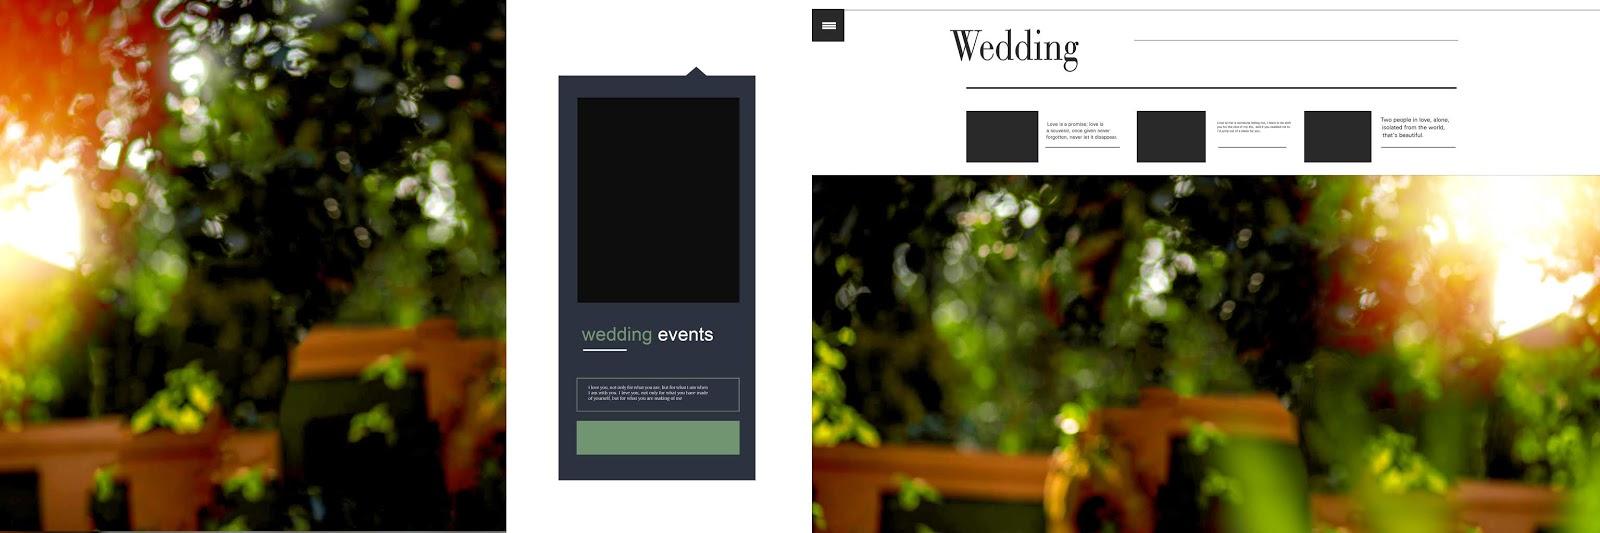 Psd Wedding Photo Album Design Templates Latest Wedding Album